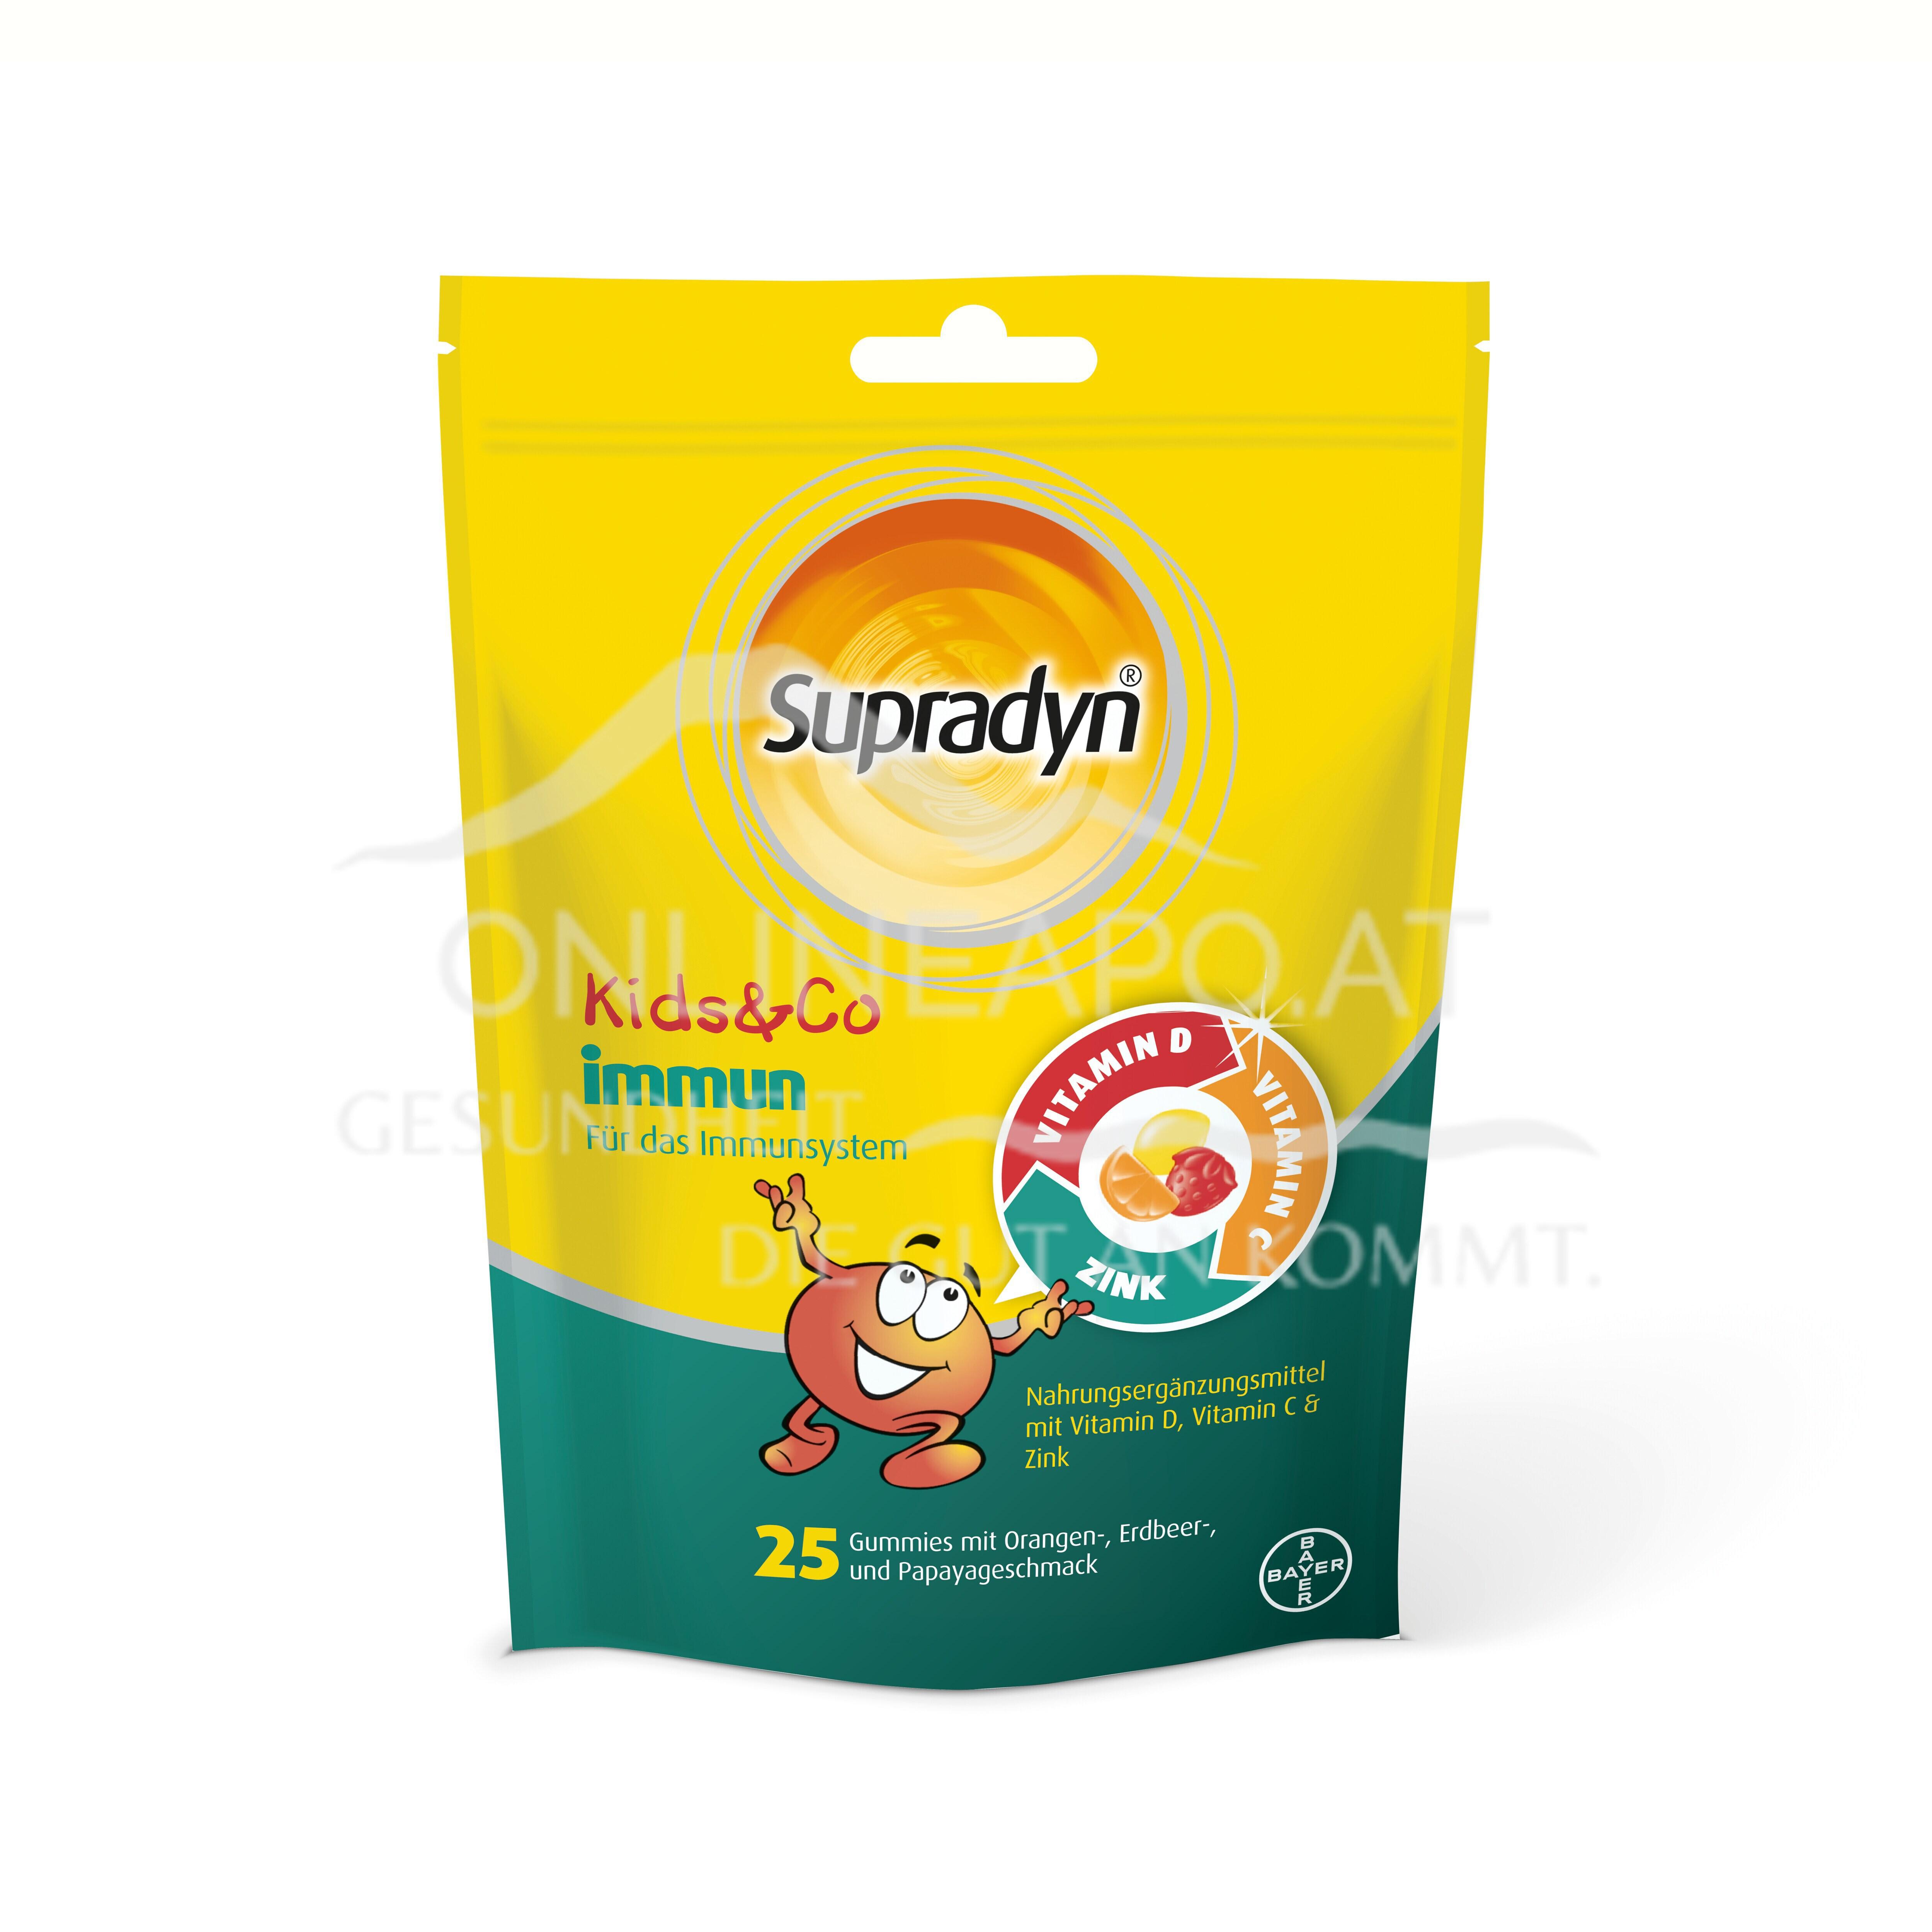 Supradyn® Kids&Co immun